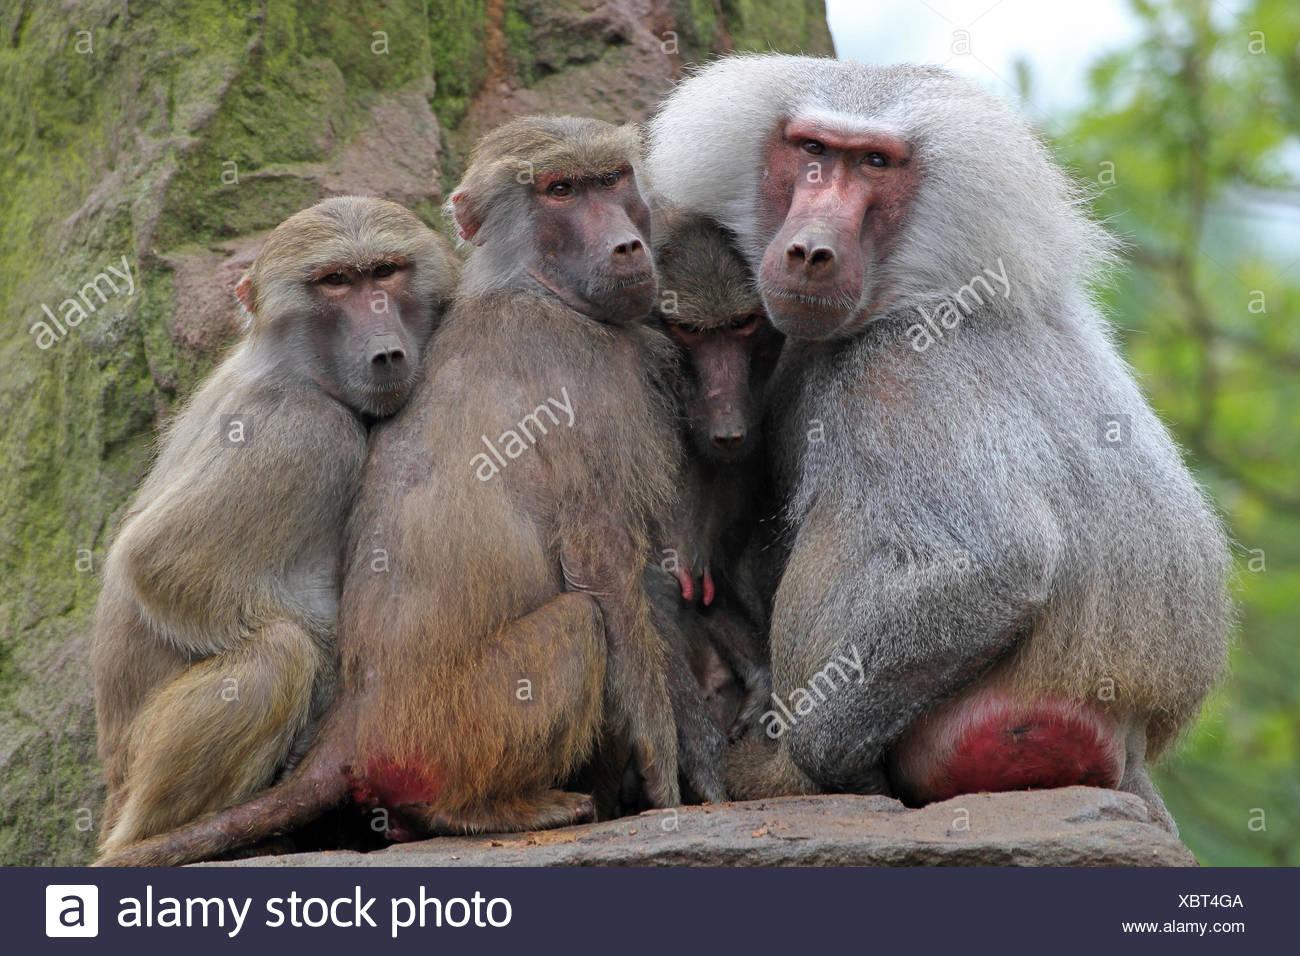 Zoo Zusammenhalt Pavian Stockbild